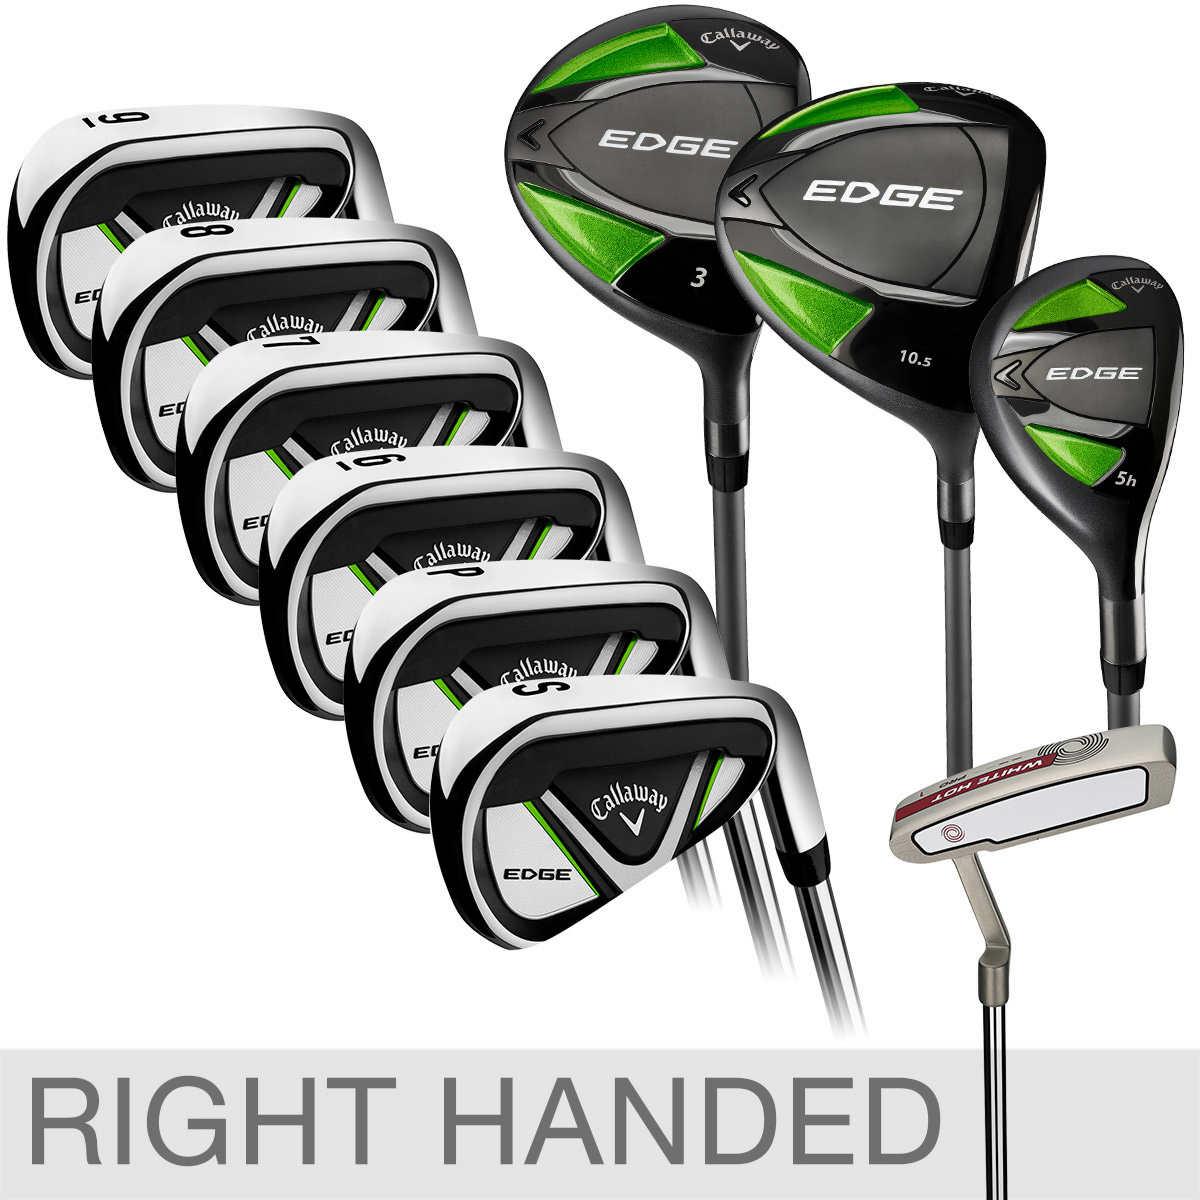 Callaway Edge 10-piece Golf Club Set, Right Handed